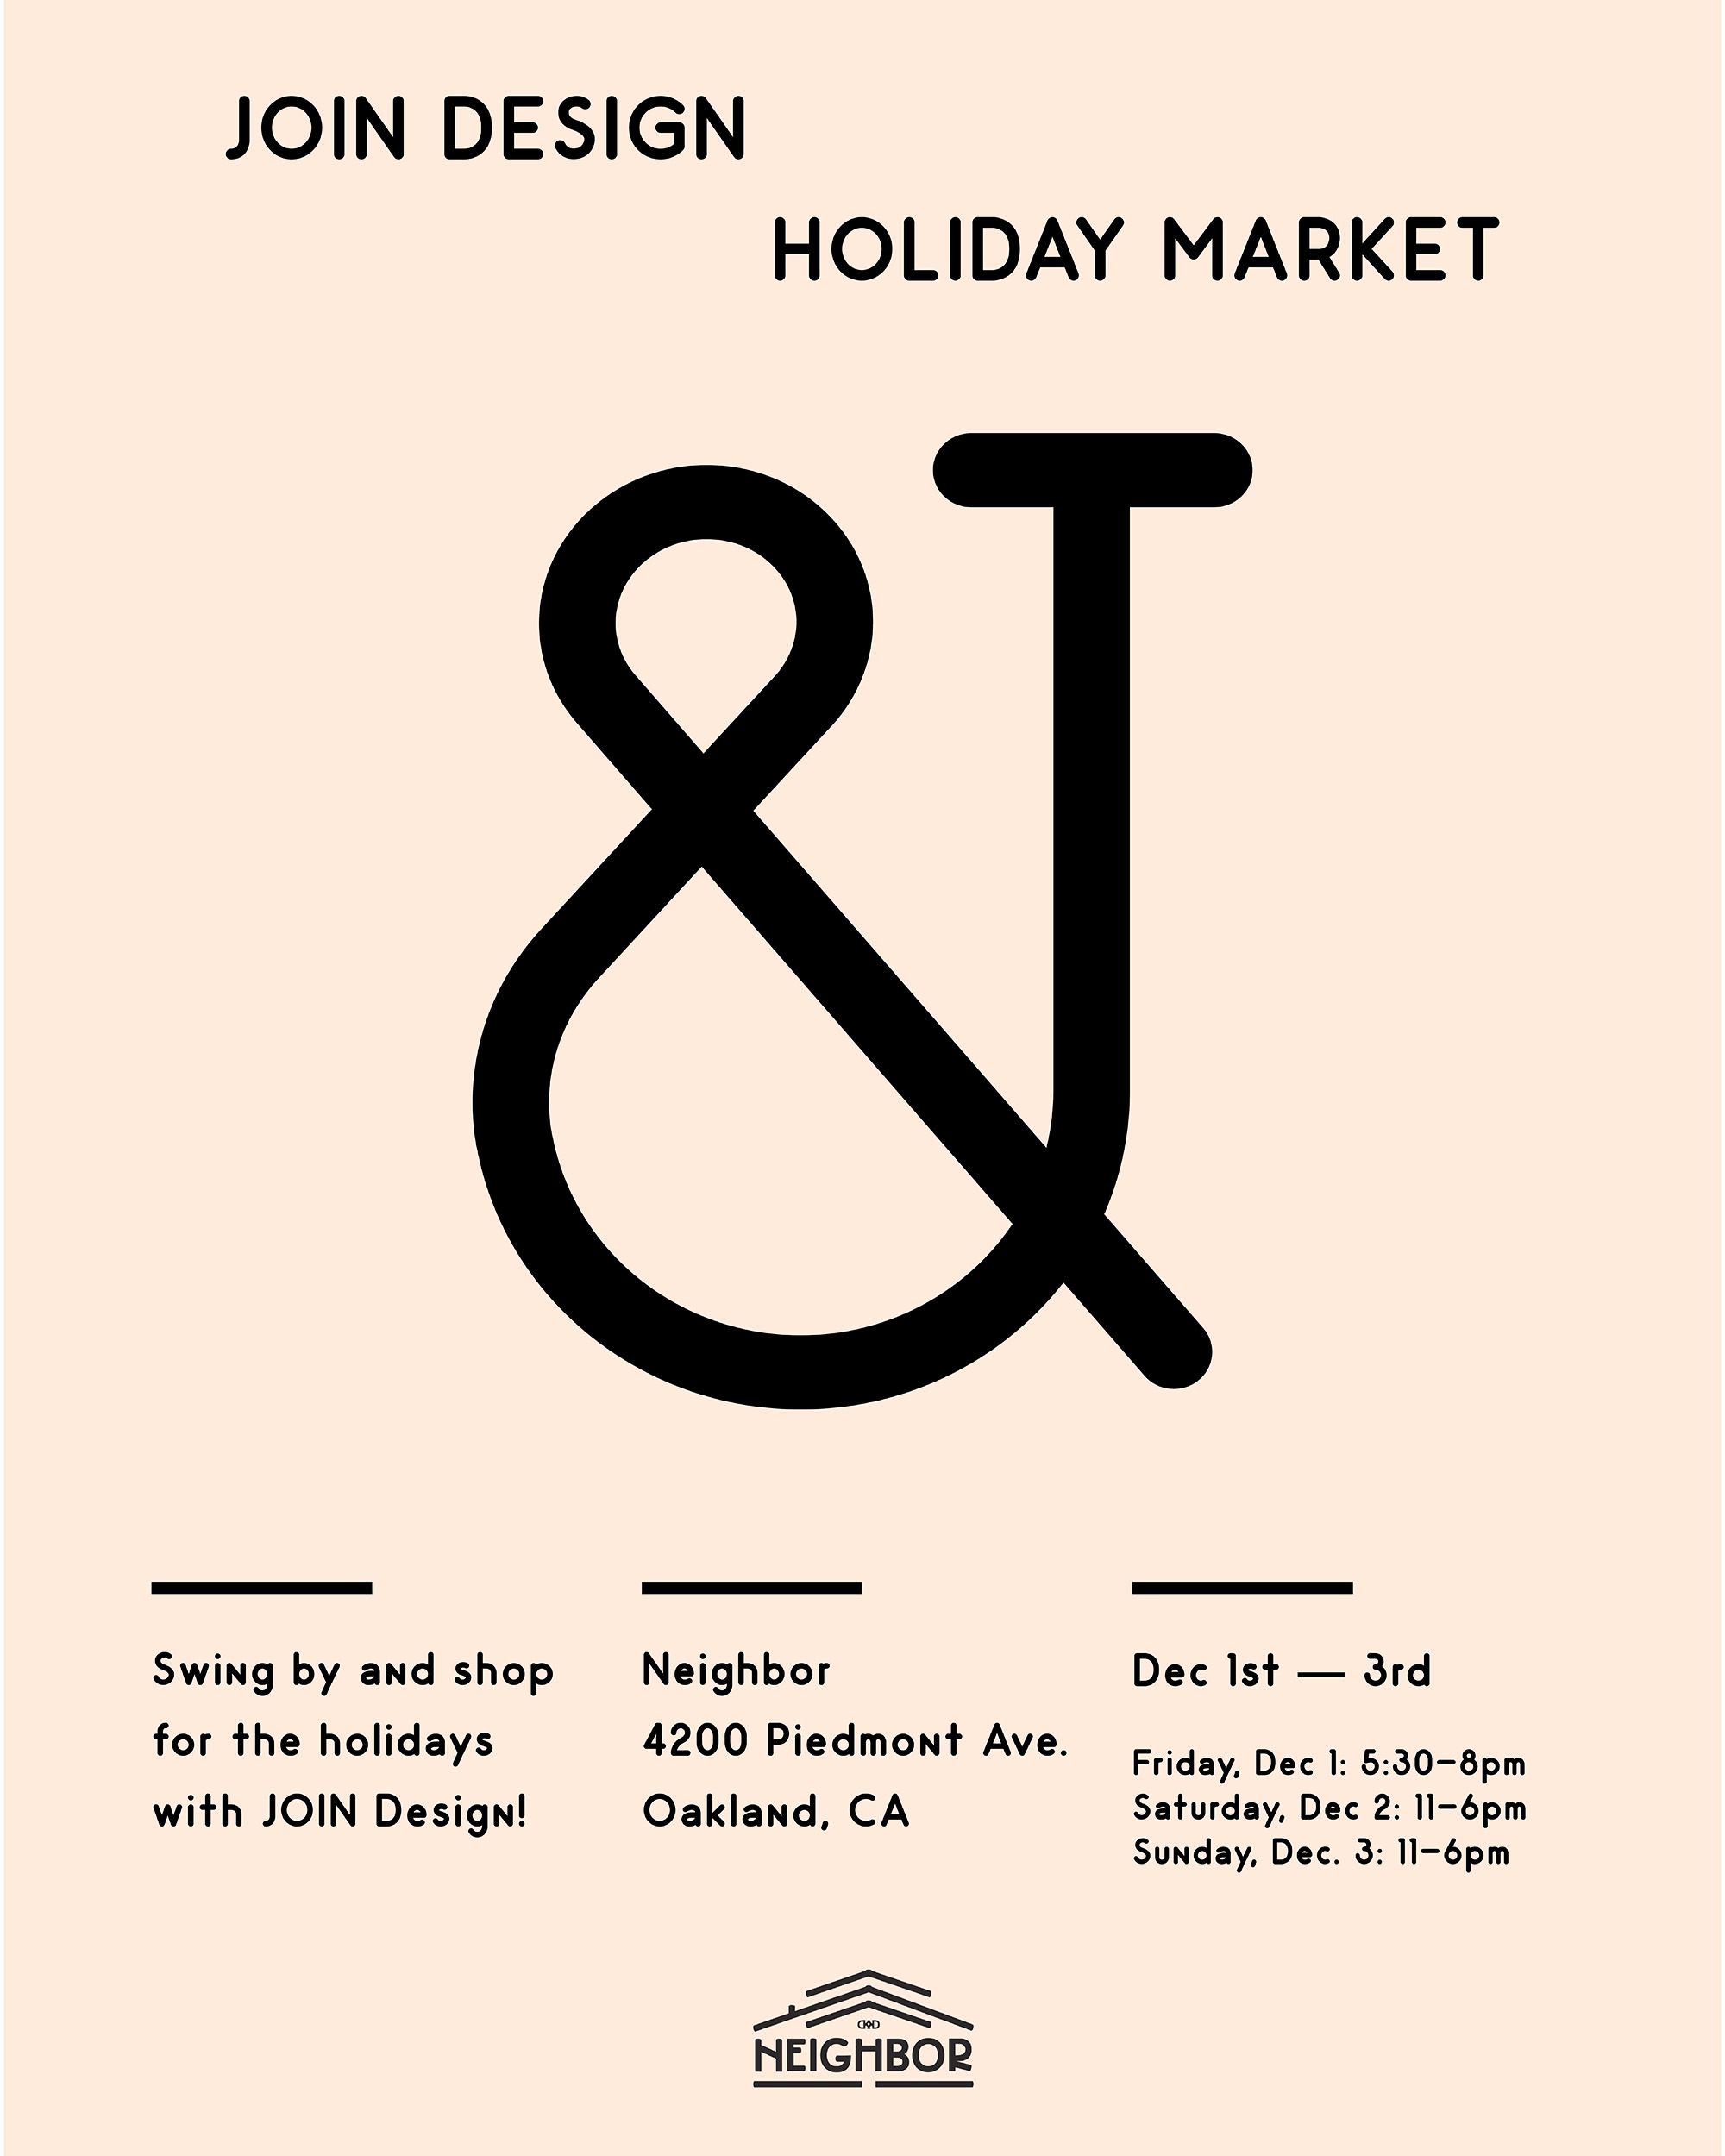 JOINHolidayMarket_Graphic-3.jpg